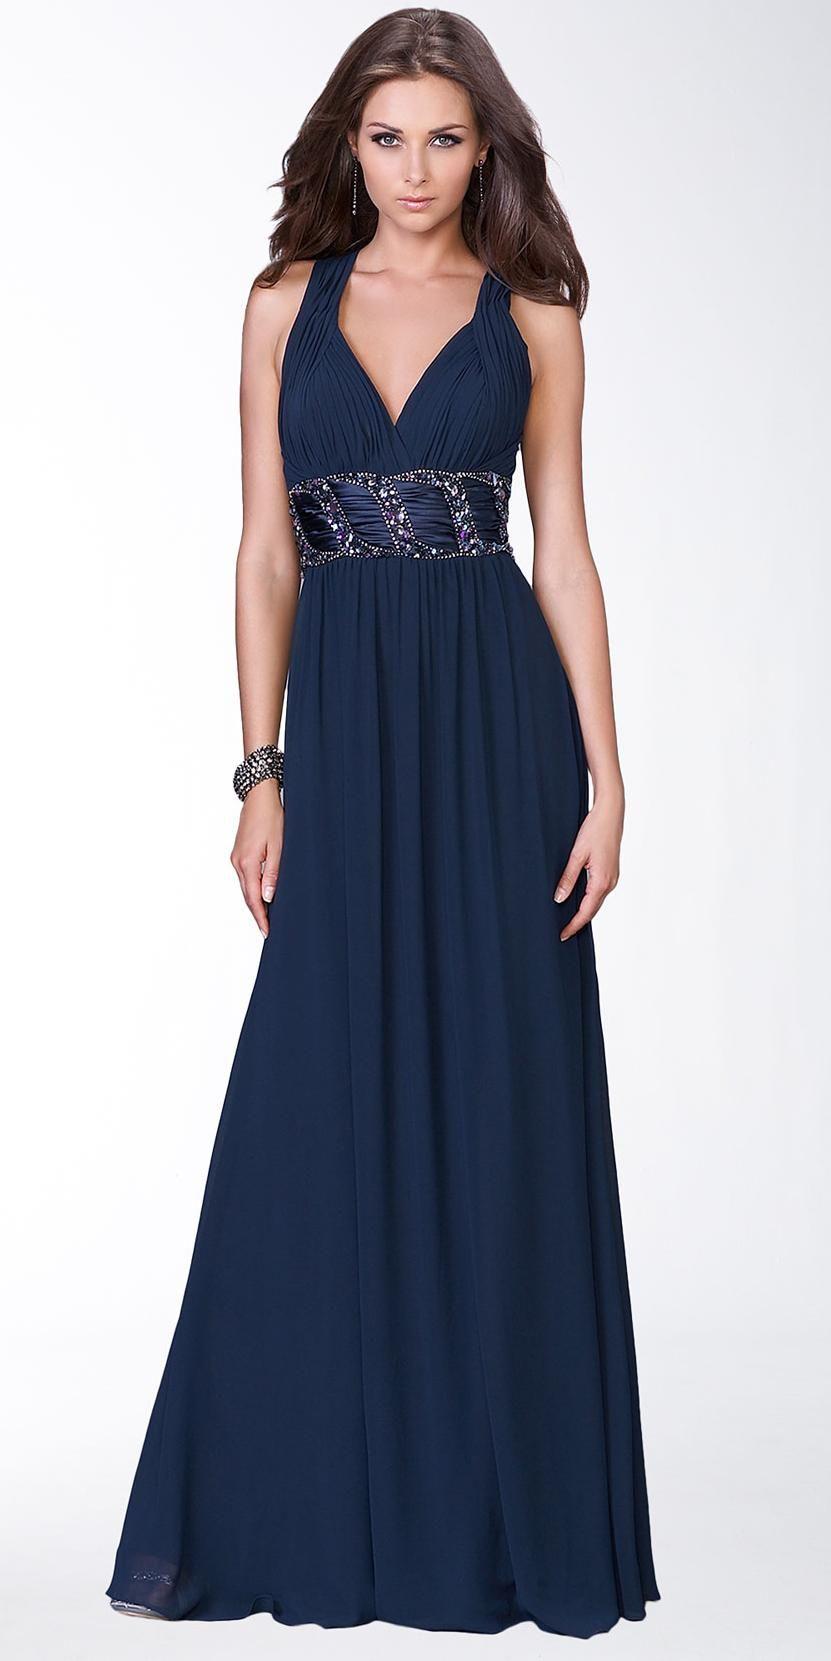 1000  images about Blue dress on Pinterest - Maxi dresses ...